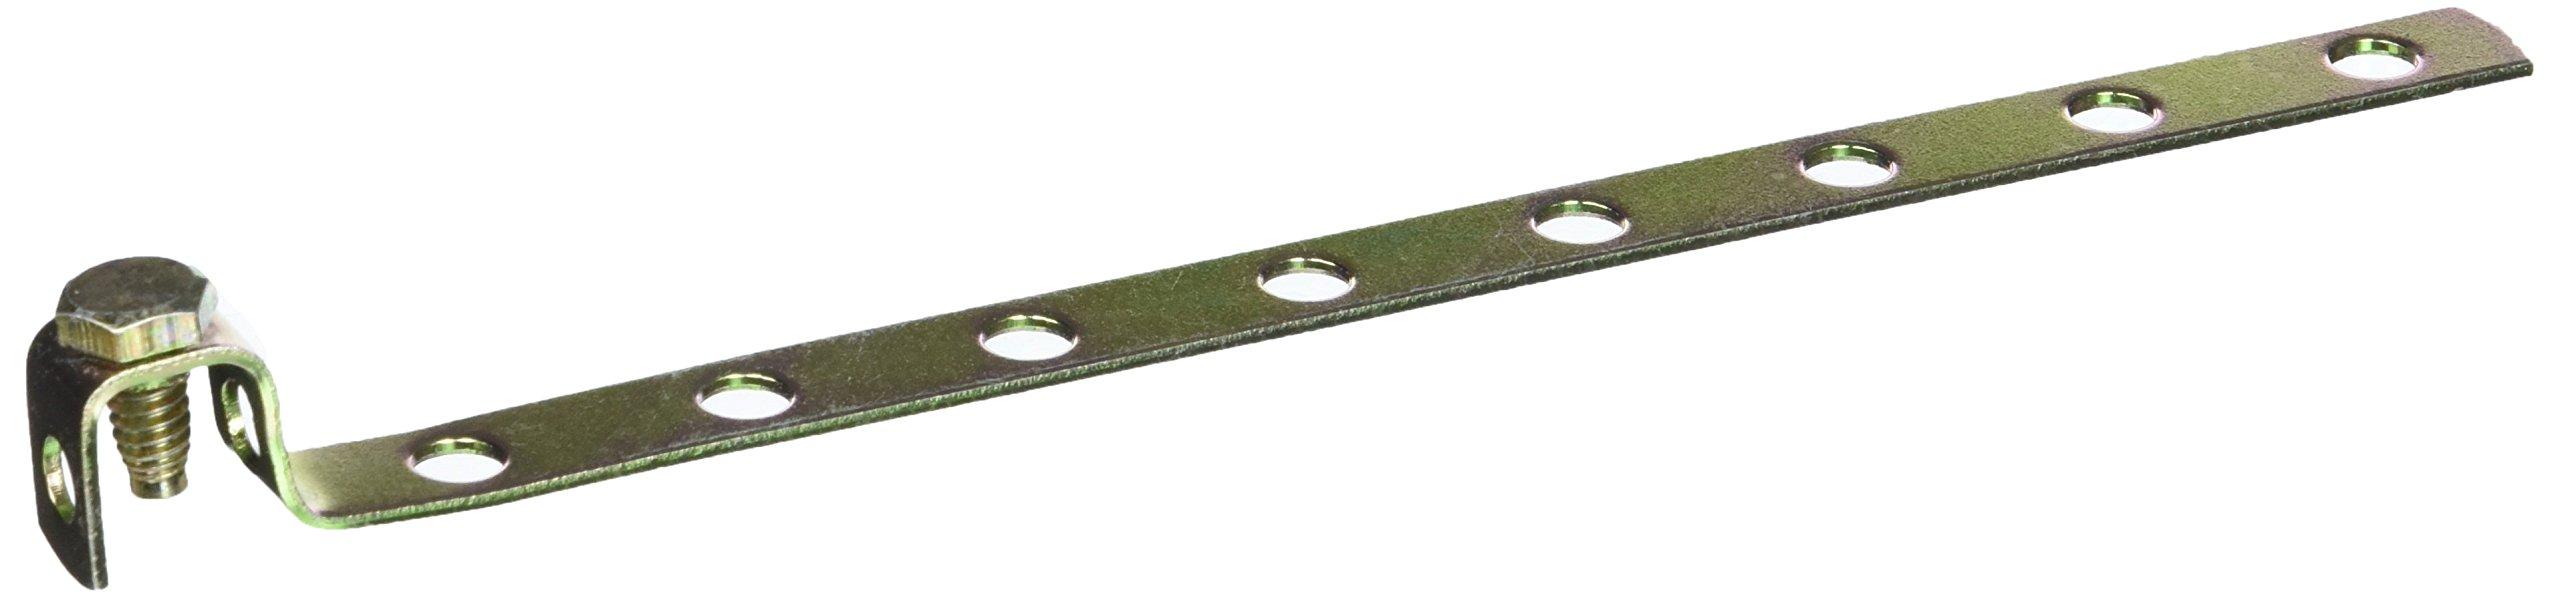 Moen 141387BRB Replacement Lift Rod, Mediterranean Bronze